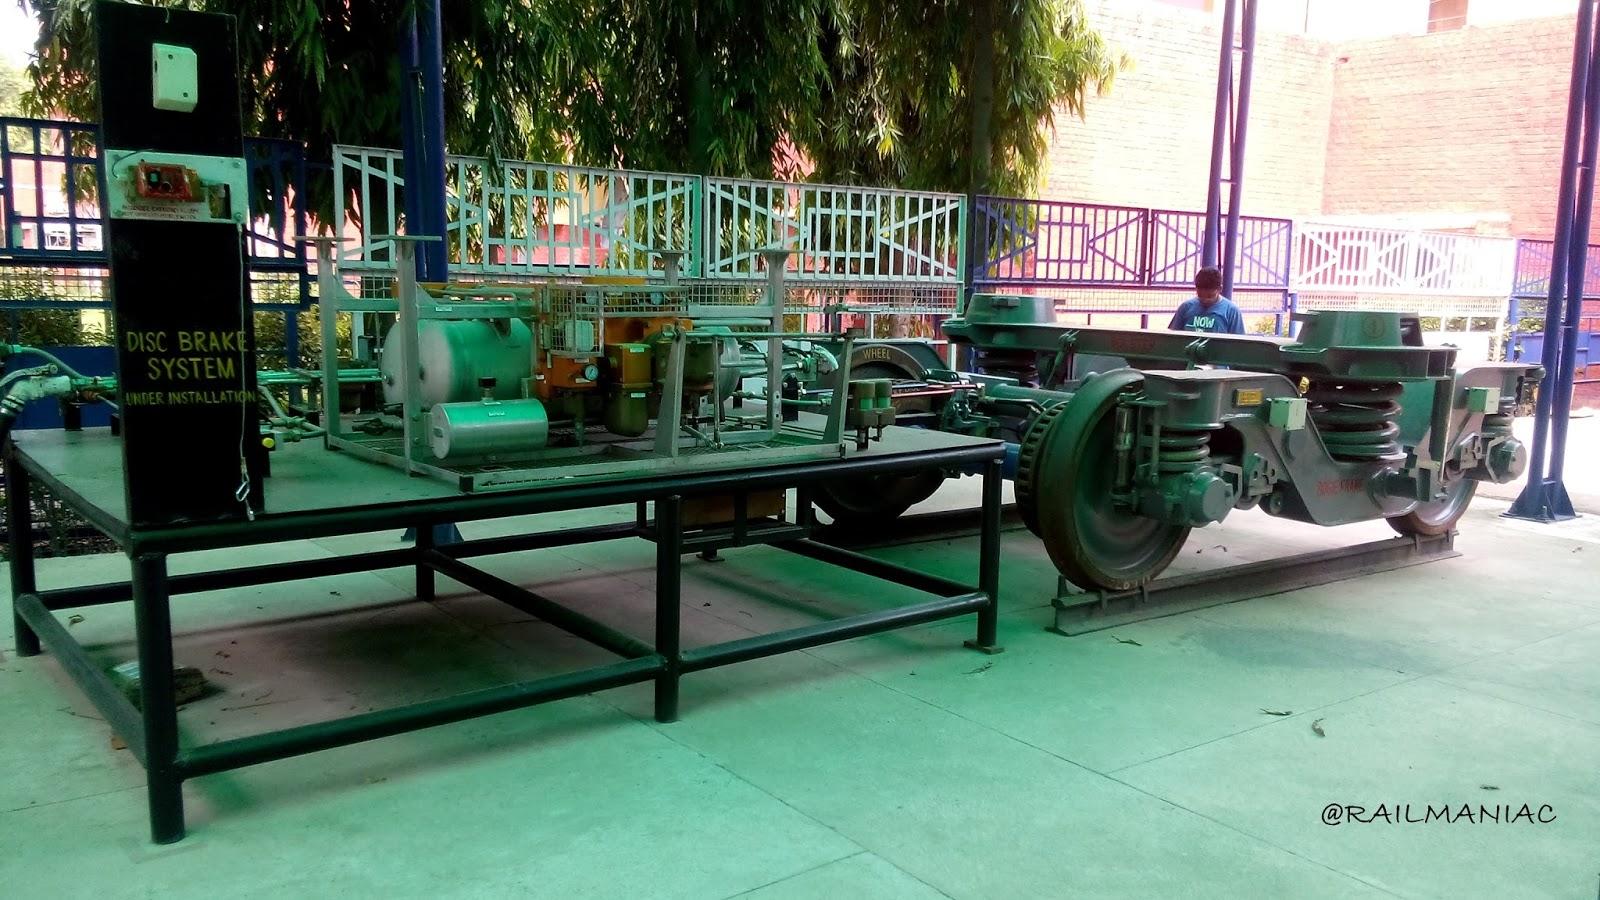 Rail Maniac Electro Pneumatic Brakes Ir Car Brake System Diagram Passenger A Model Of E R At Rcf